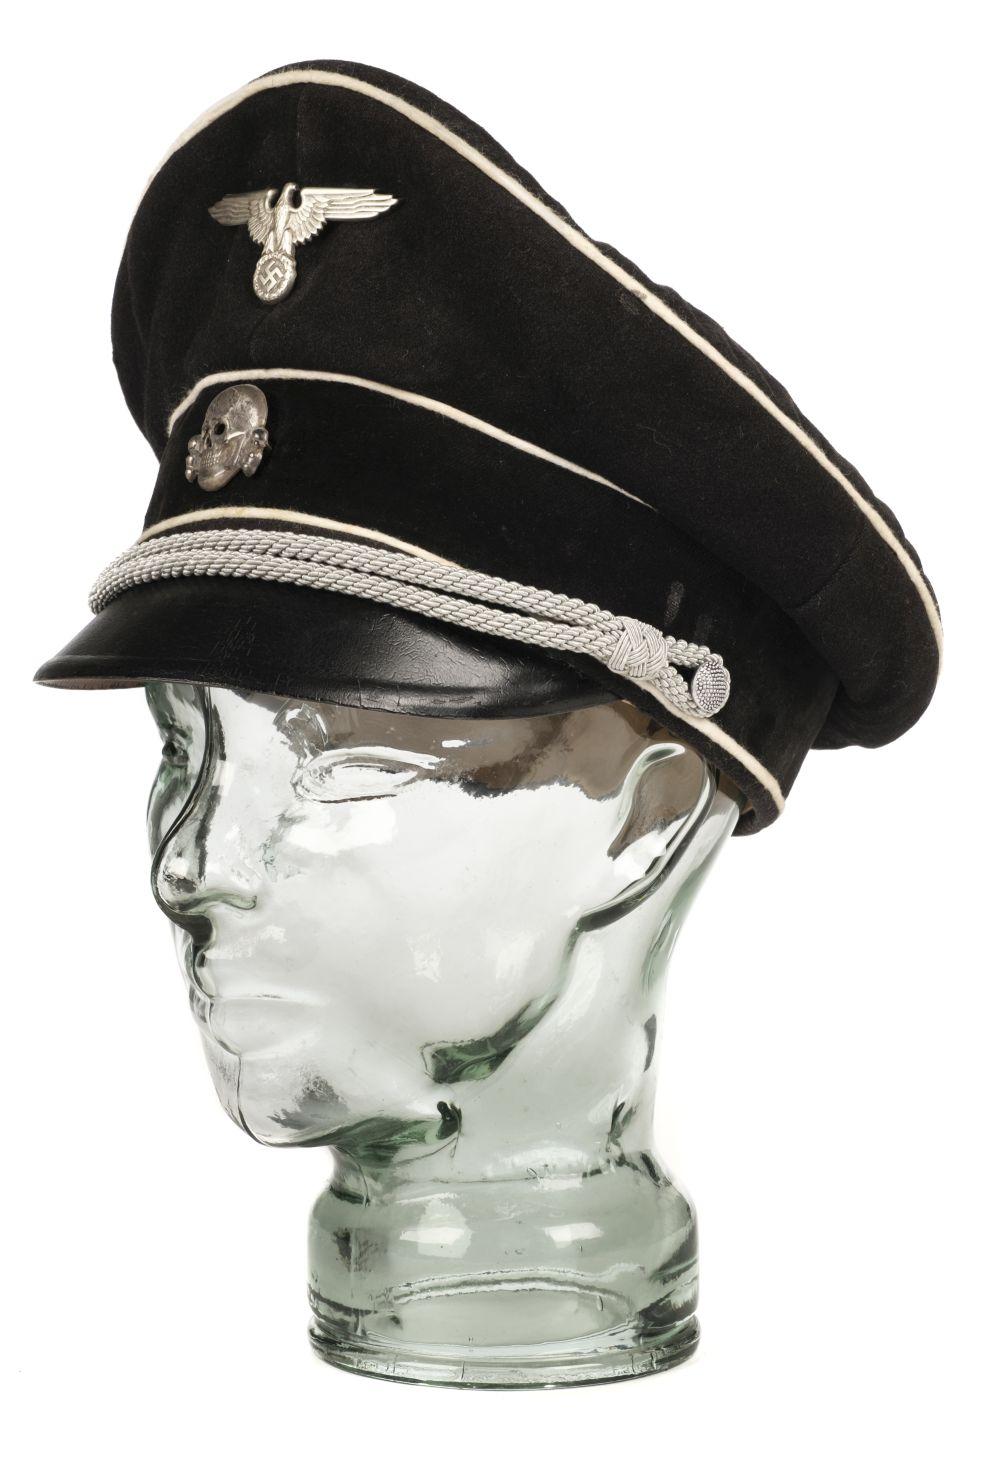 * Third Reich. WWII SS Officer's visor